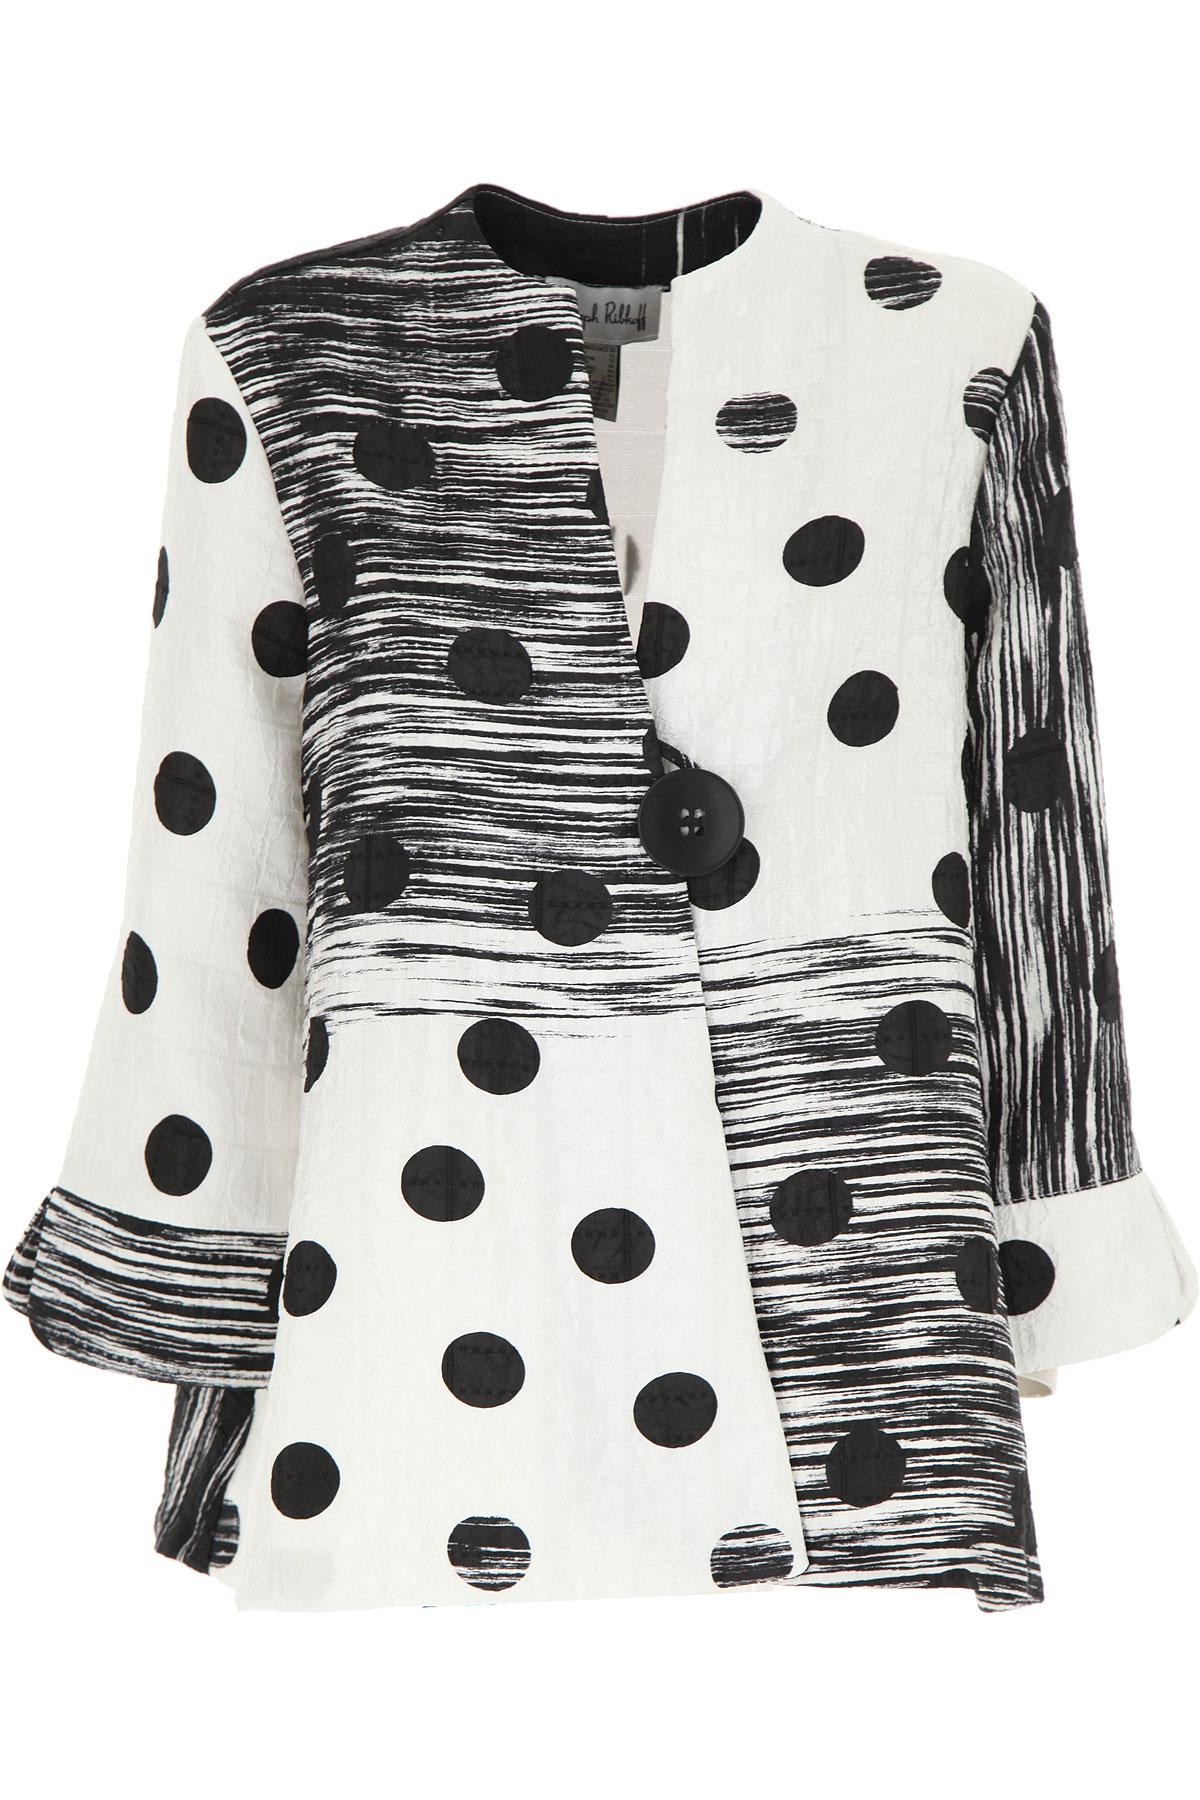 Joseph Ribkoff Jacket for Women On Sale, Black, polyester, 2019, 10 8